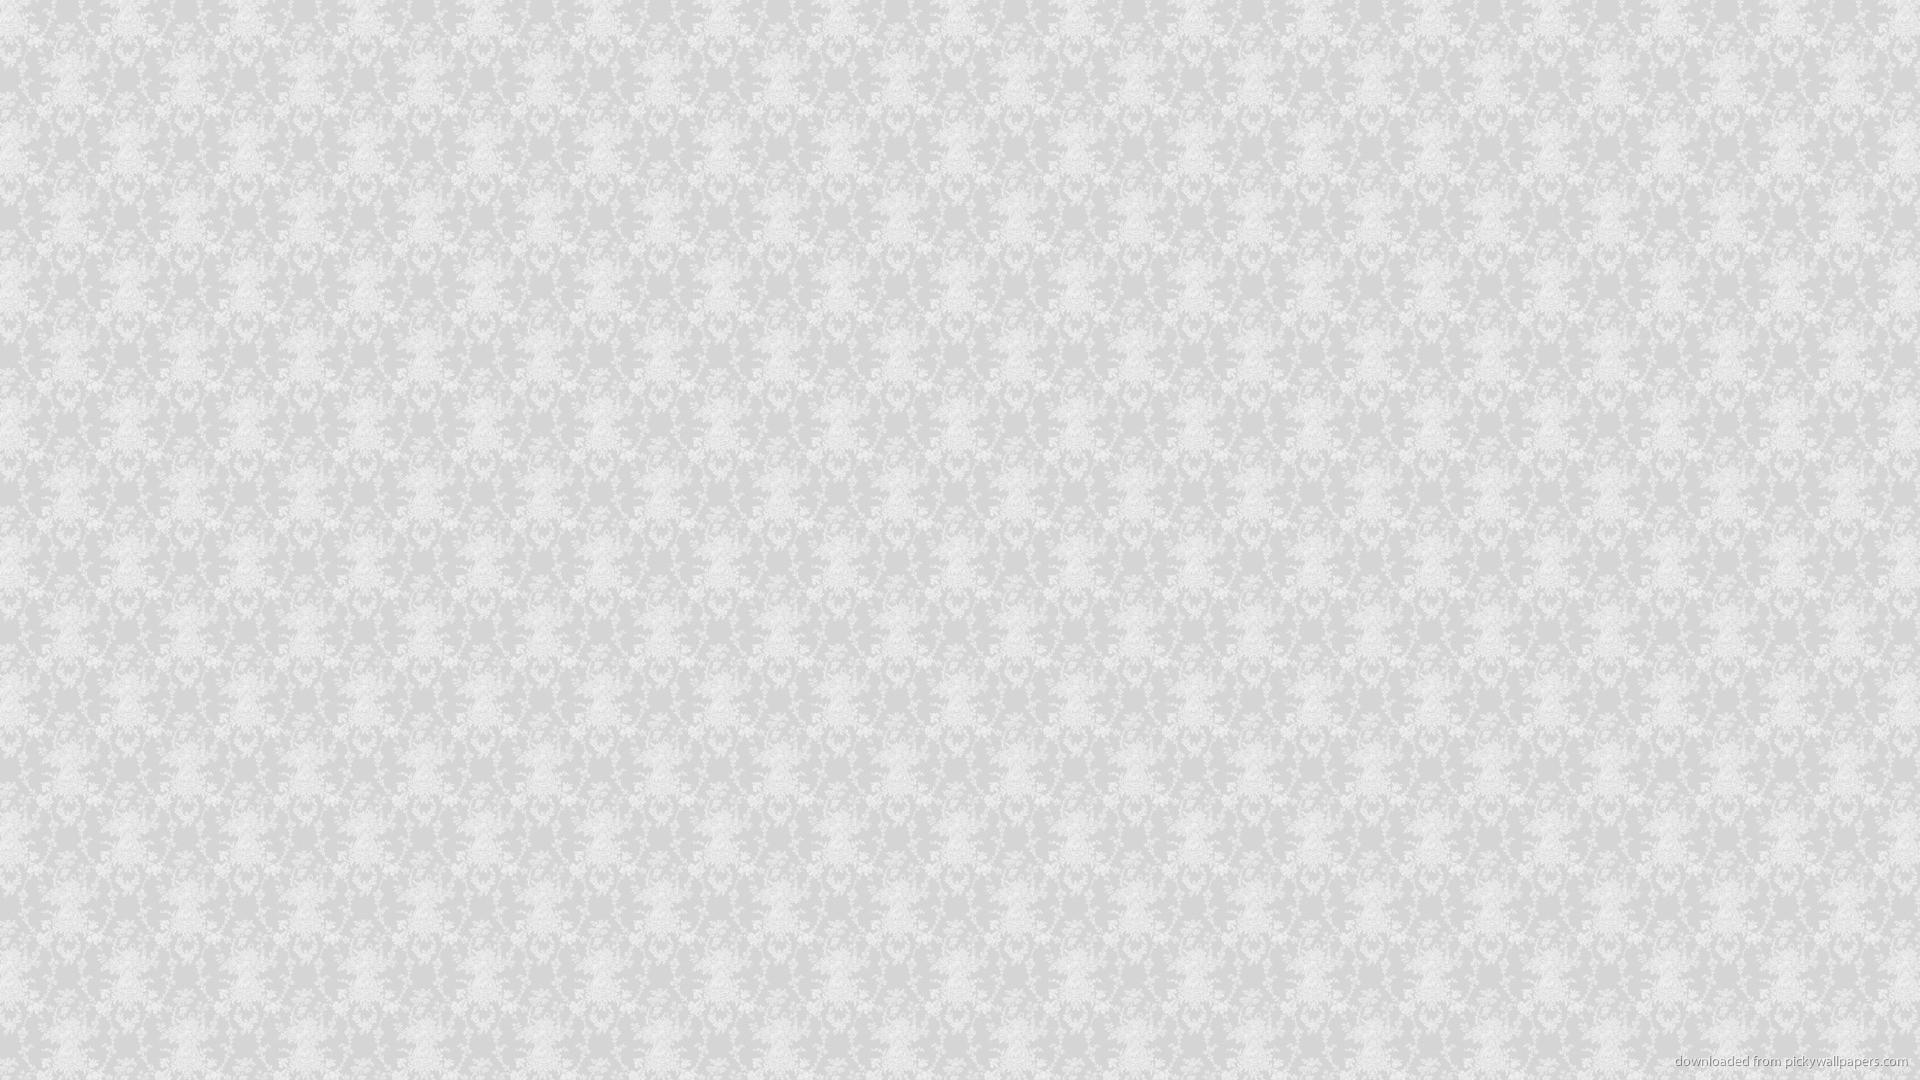 Translucent desktop wallpaper download